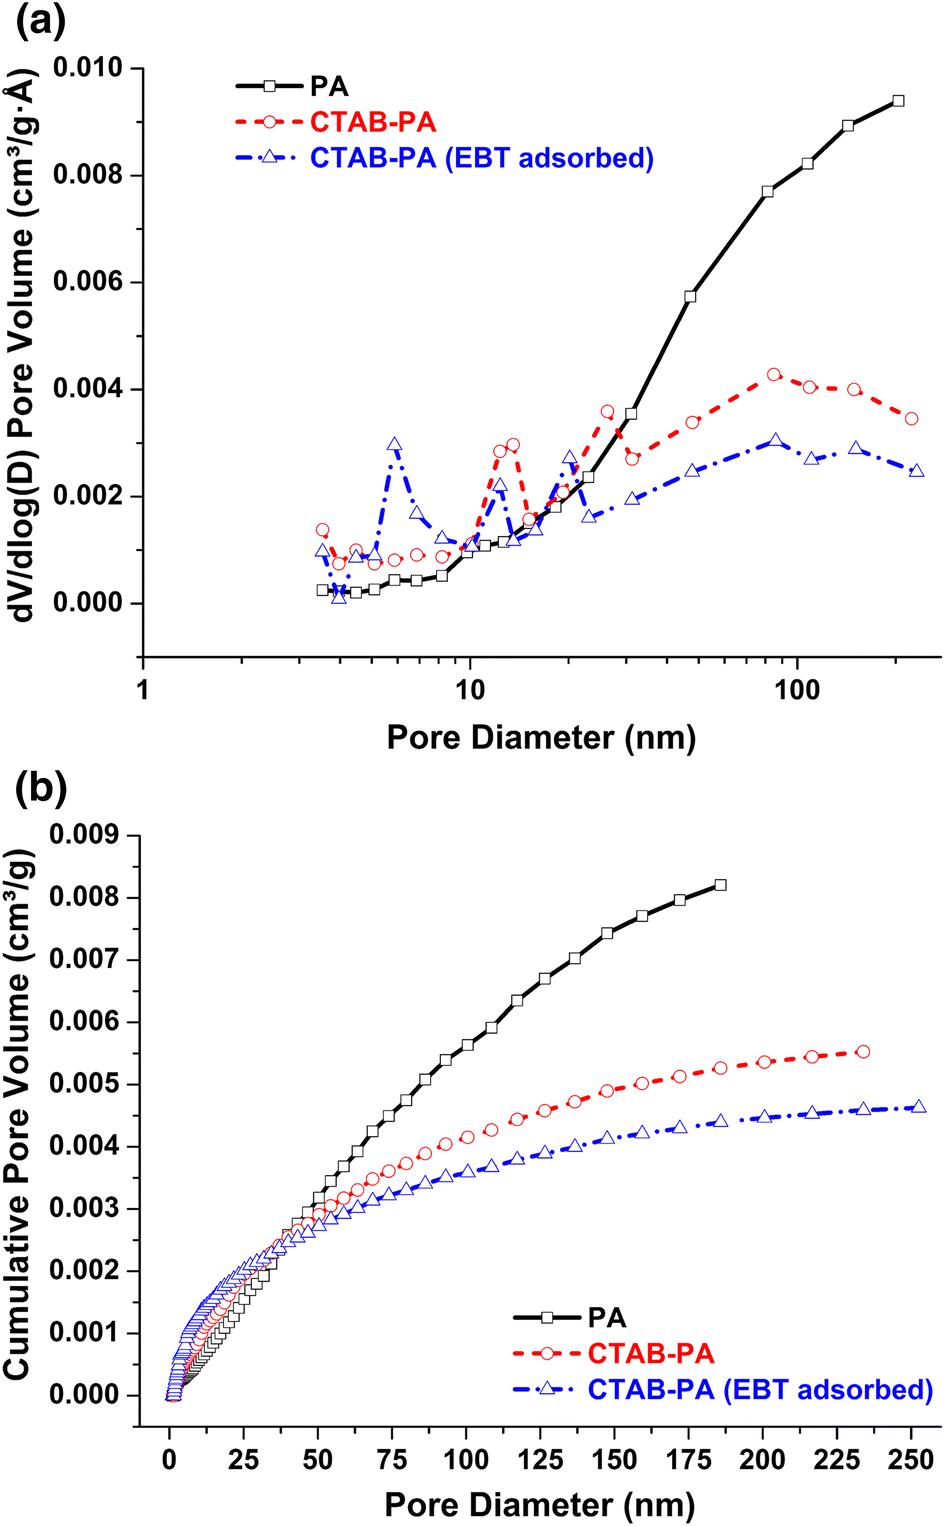 Cetyltrimethylammonium bromide-treated Phragmites australis